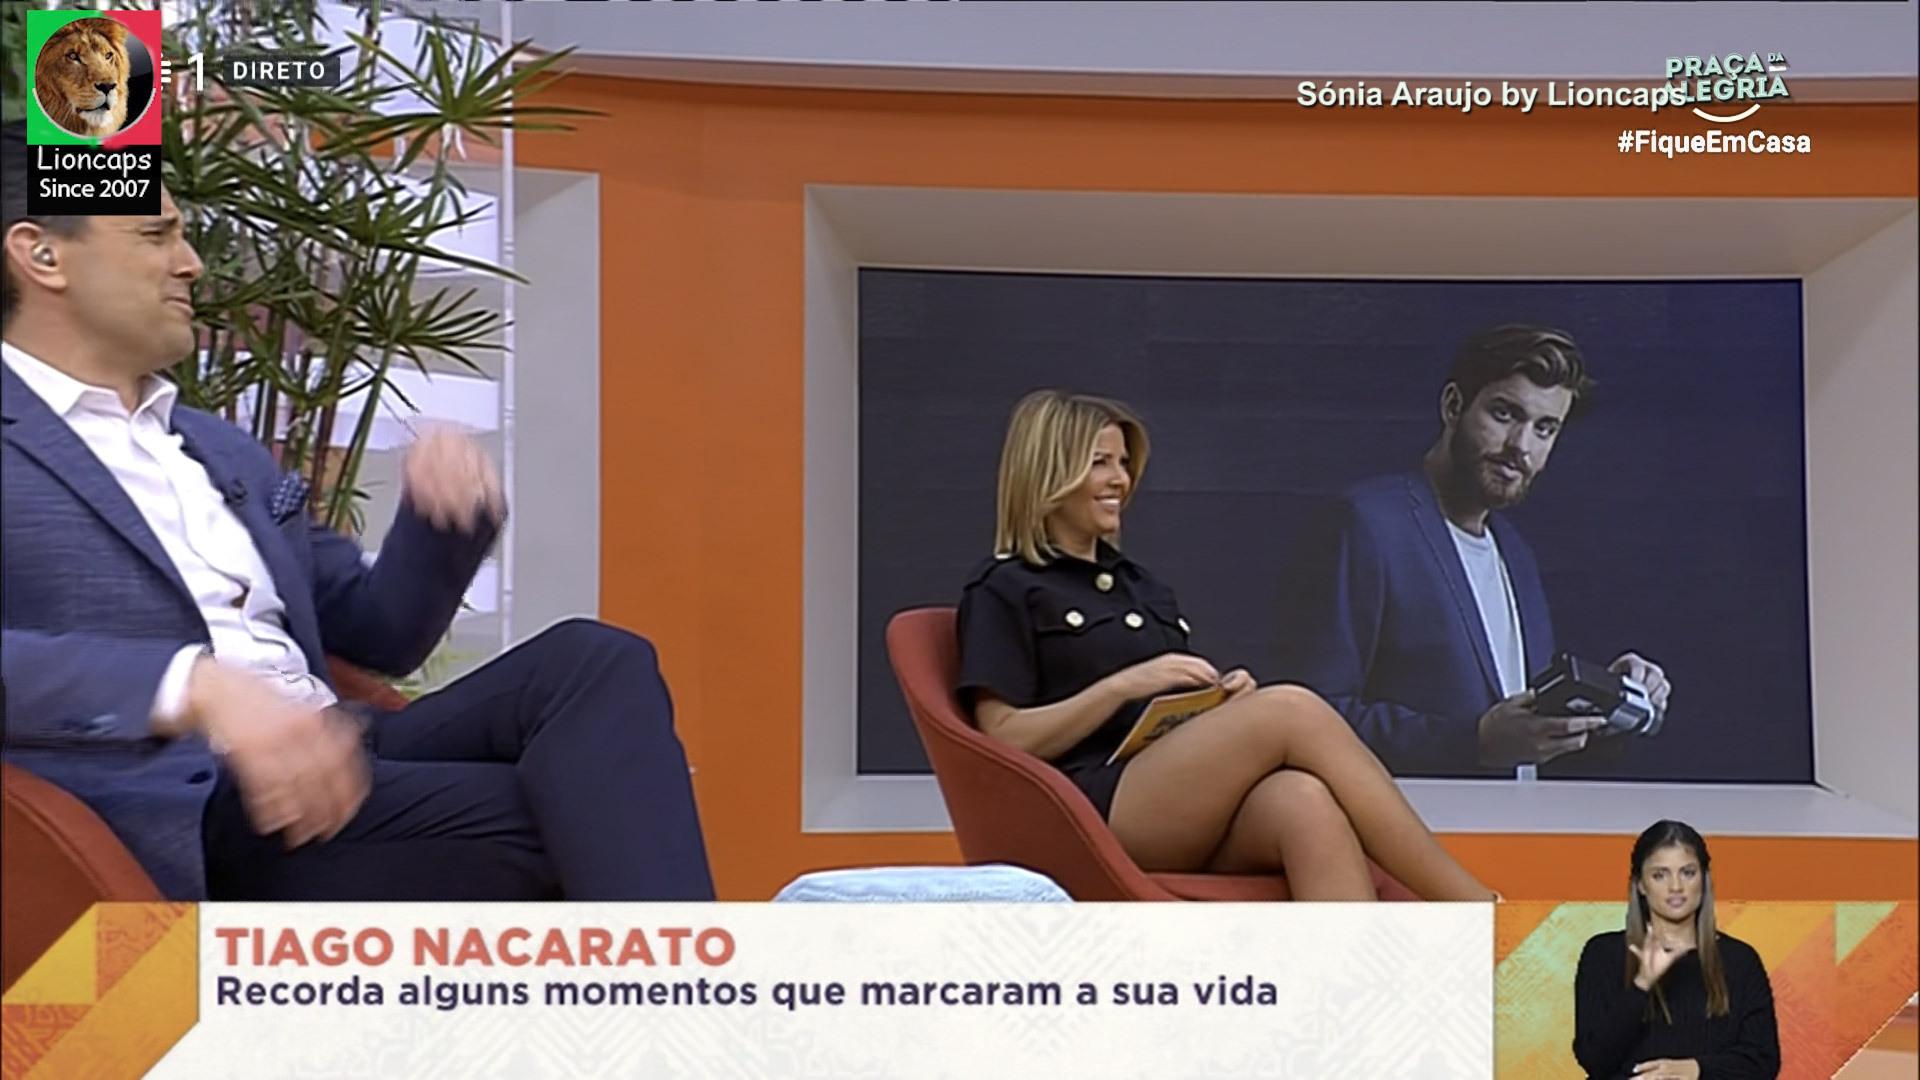 sonia_araujo_praca_lioncaps_11_04_2021 (4).jpg